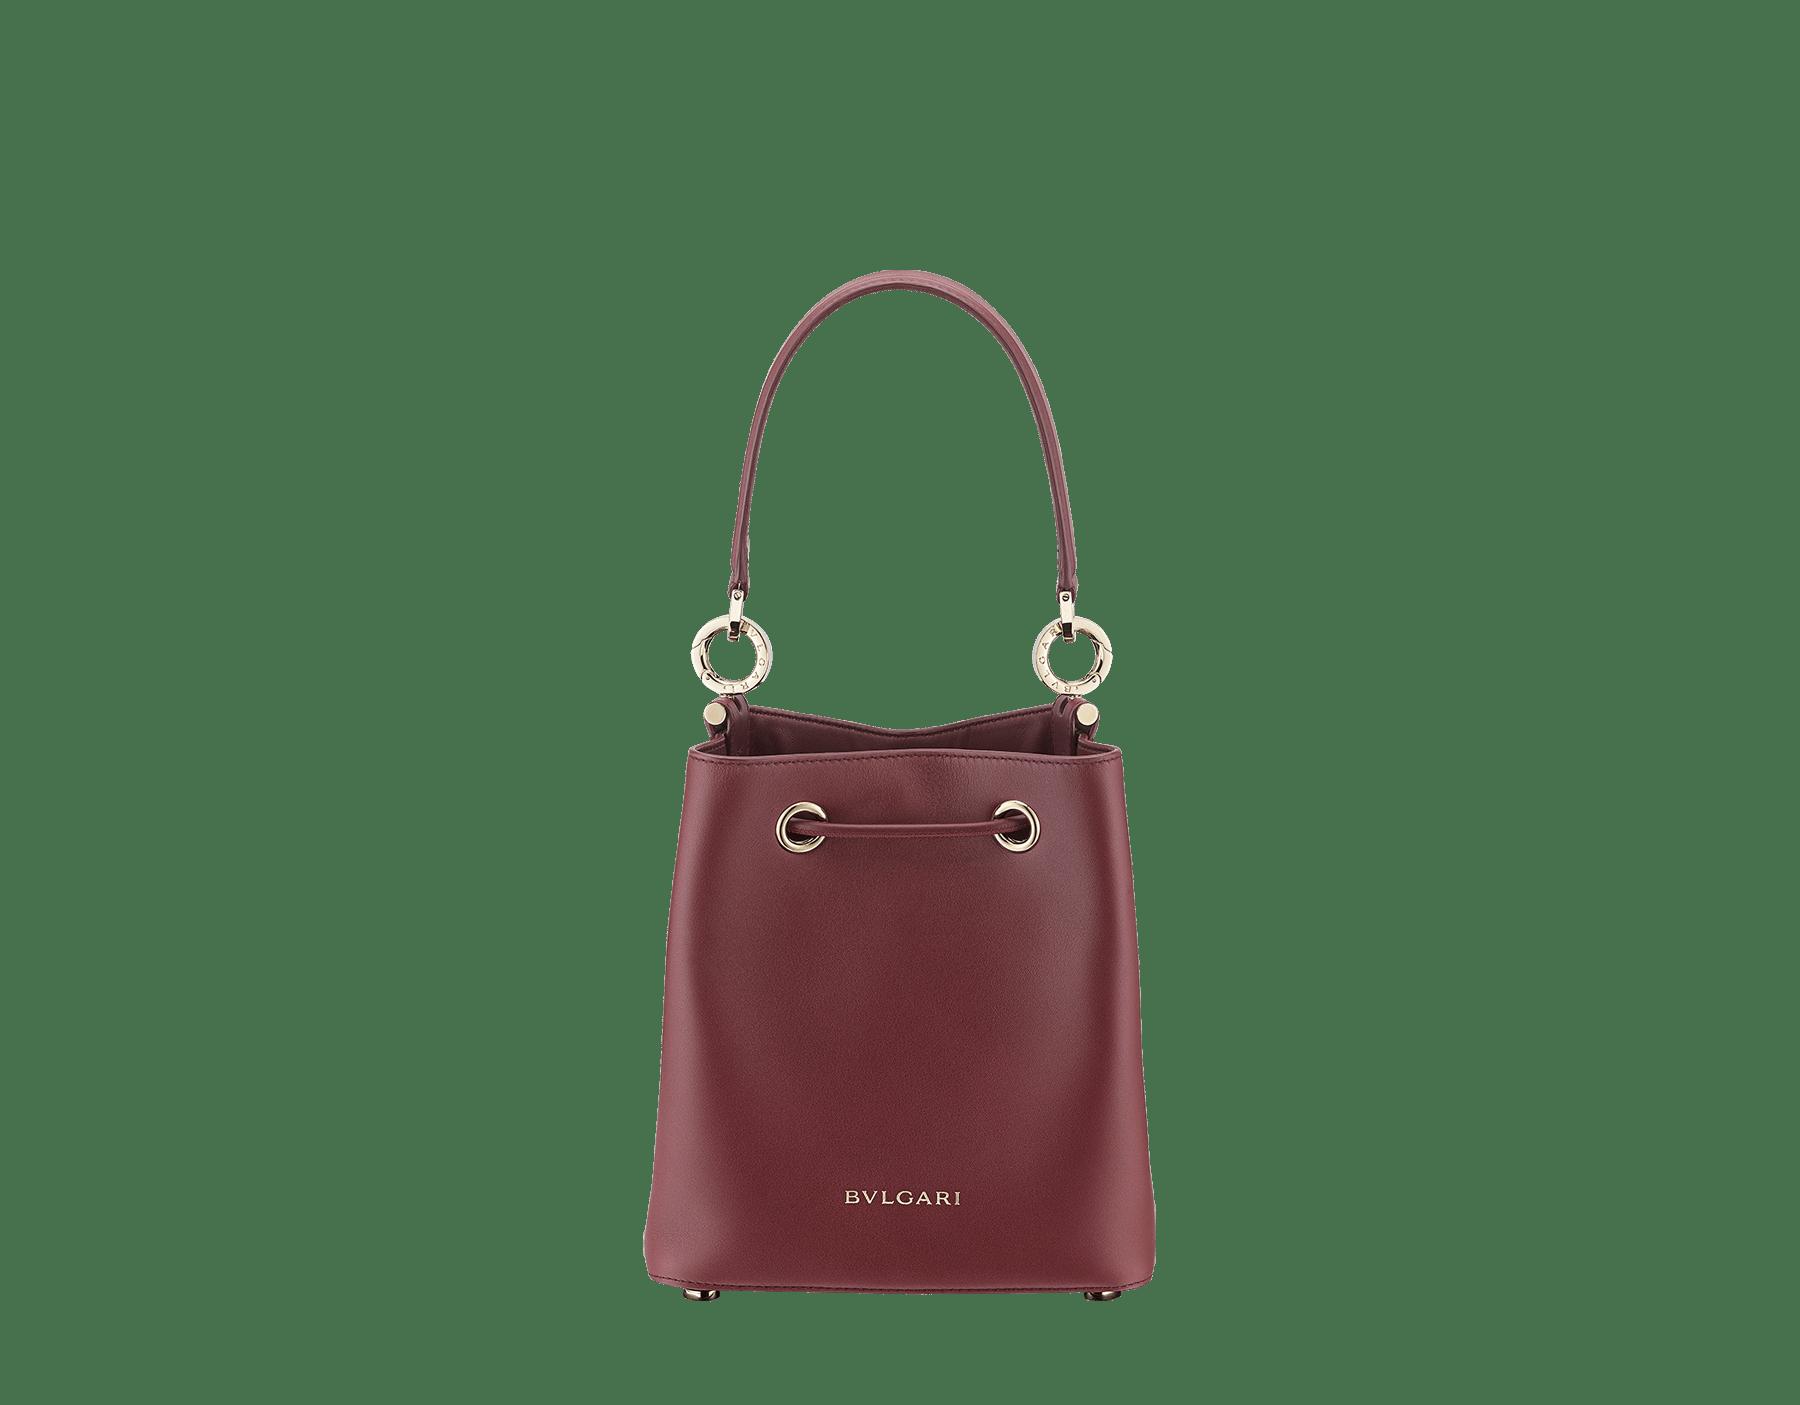 Bucket B.zero1 in rosa di francia Sahara karung skin and Roman garnet smooth calf leather with a Roman garnet nappa interior. Hardware in light gold plated brass, featuring B.zero1 décor. 289002 image 3